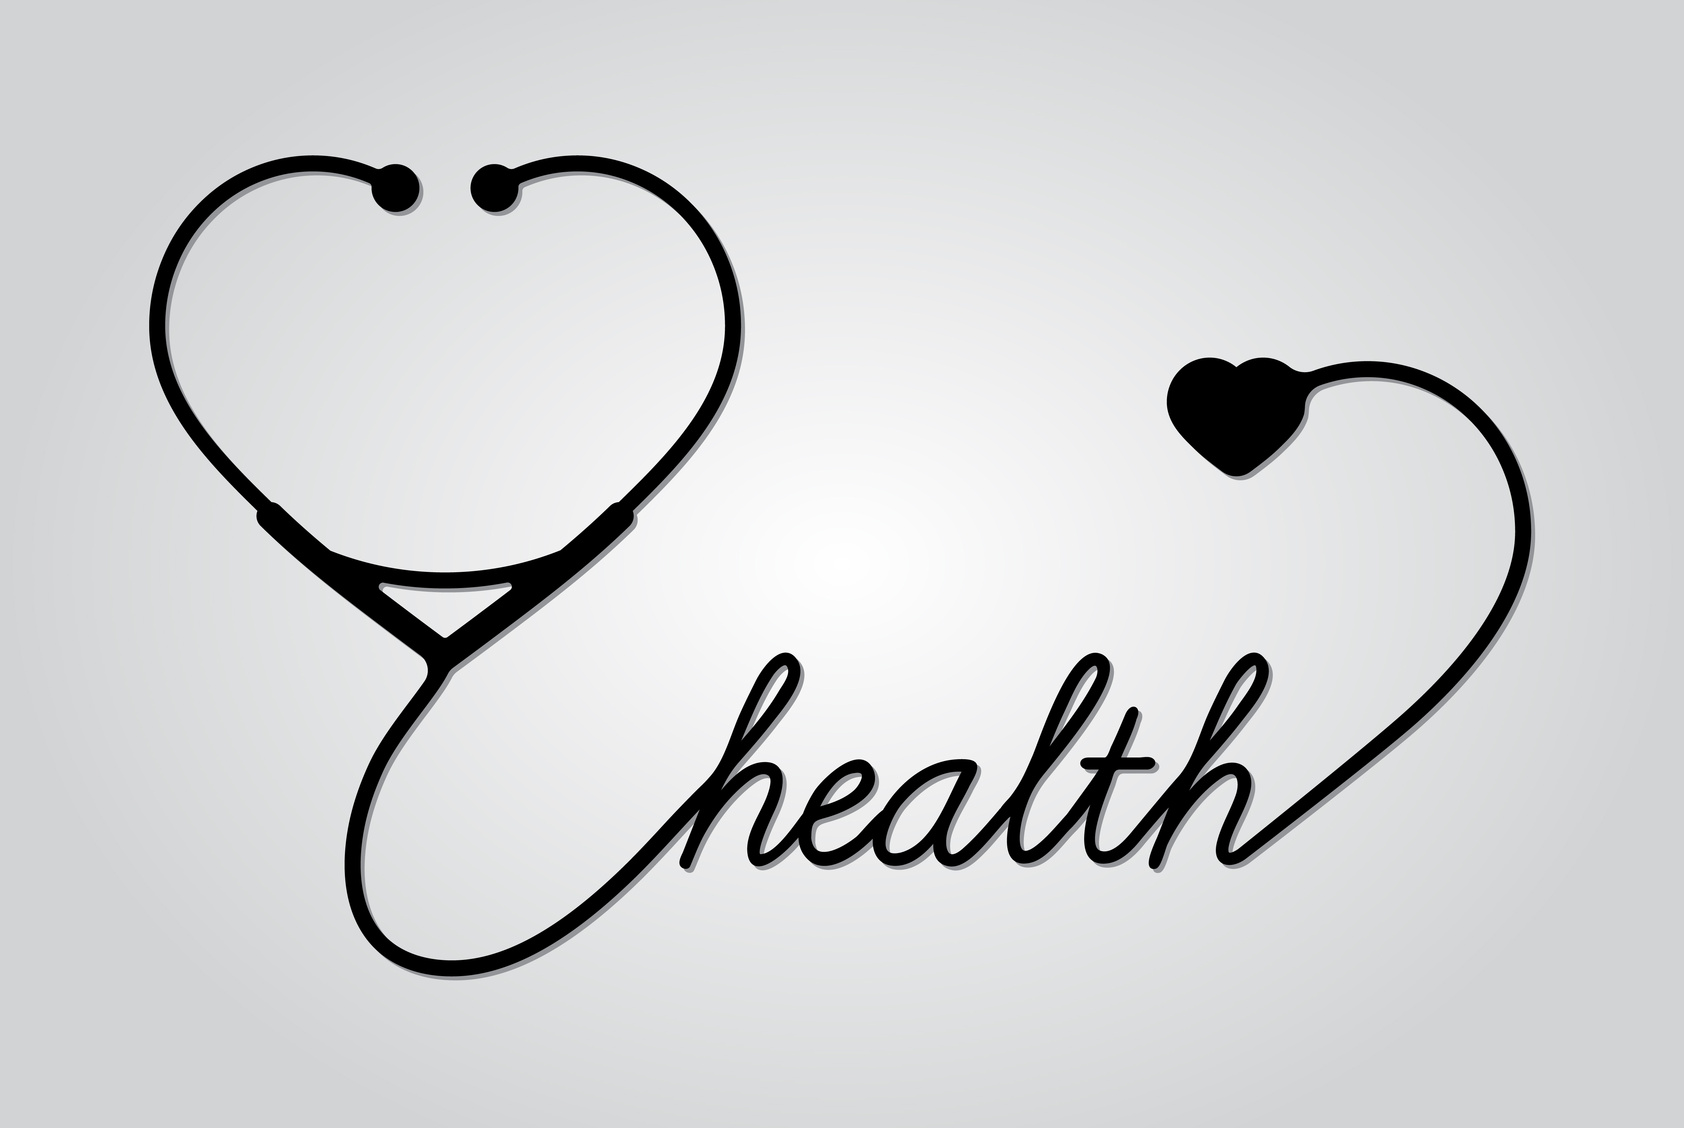 La Habra Individual Health Insurance Policy